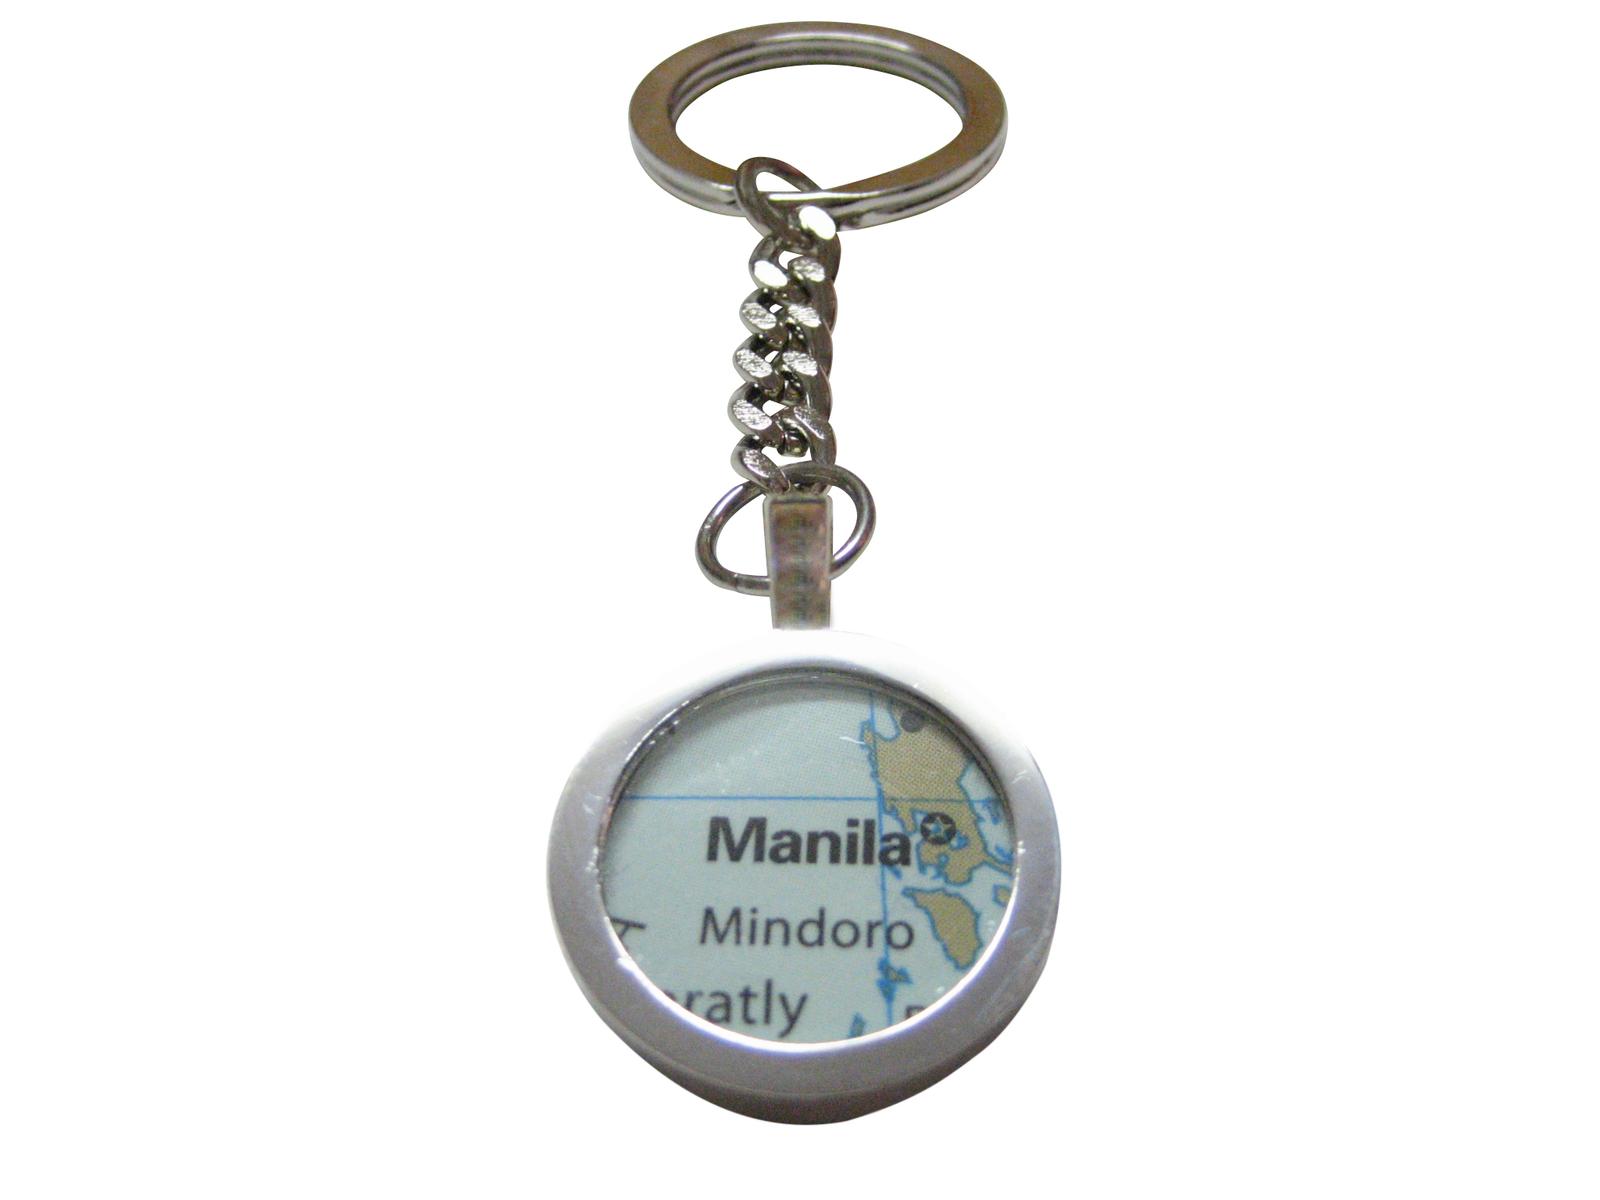 manila philippines map pendant key chain jewelry s